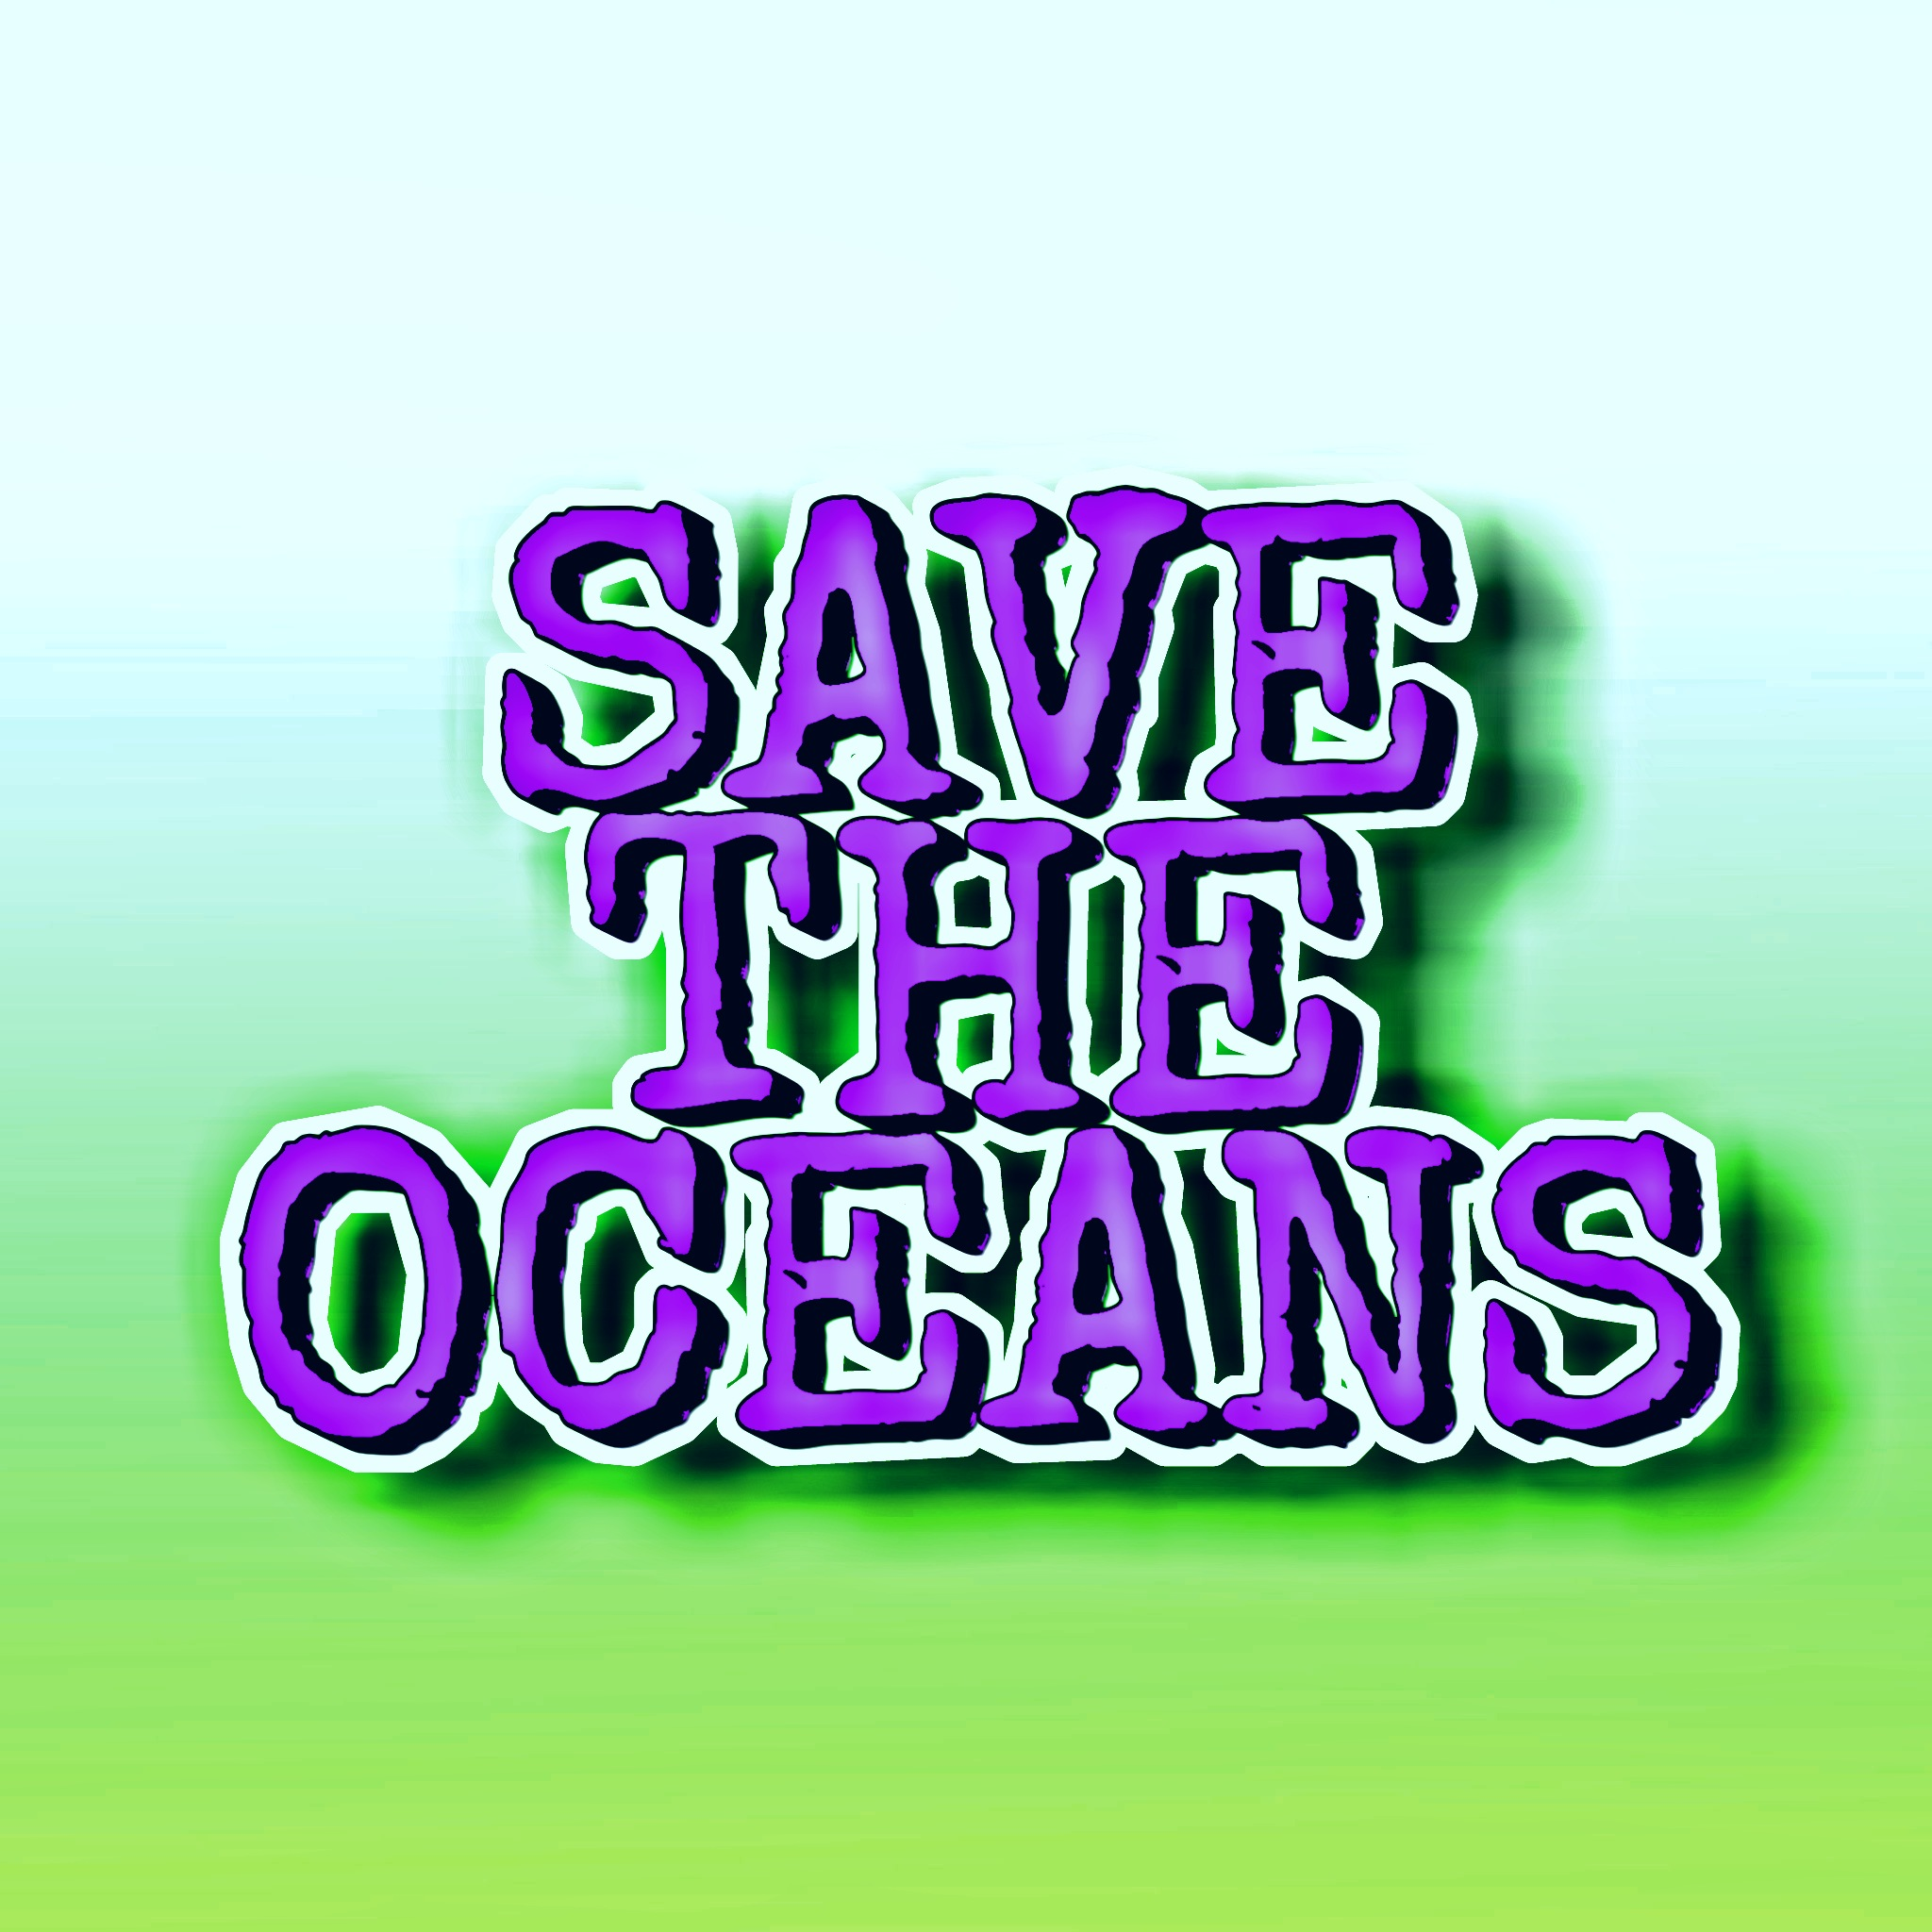 Save the ocean illustration